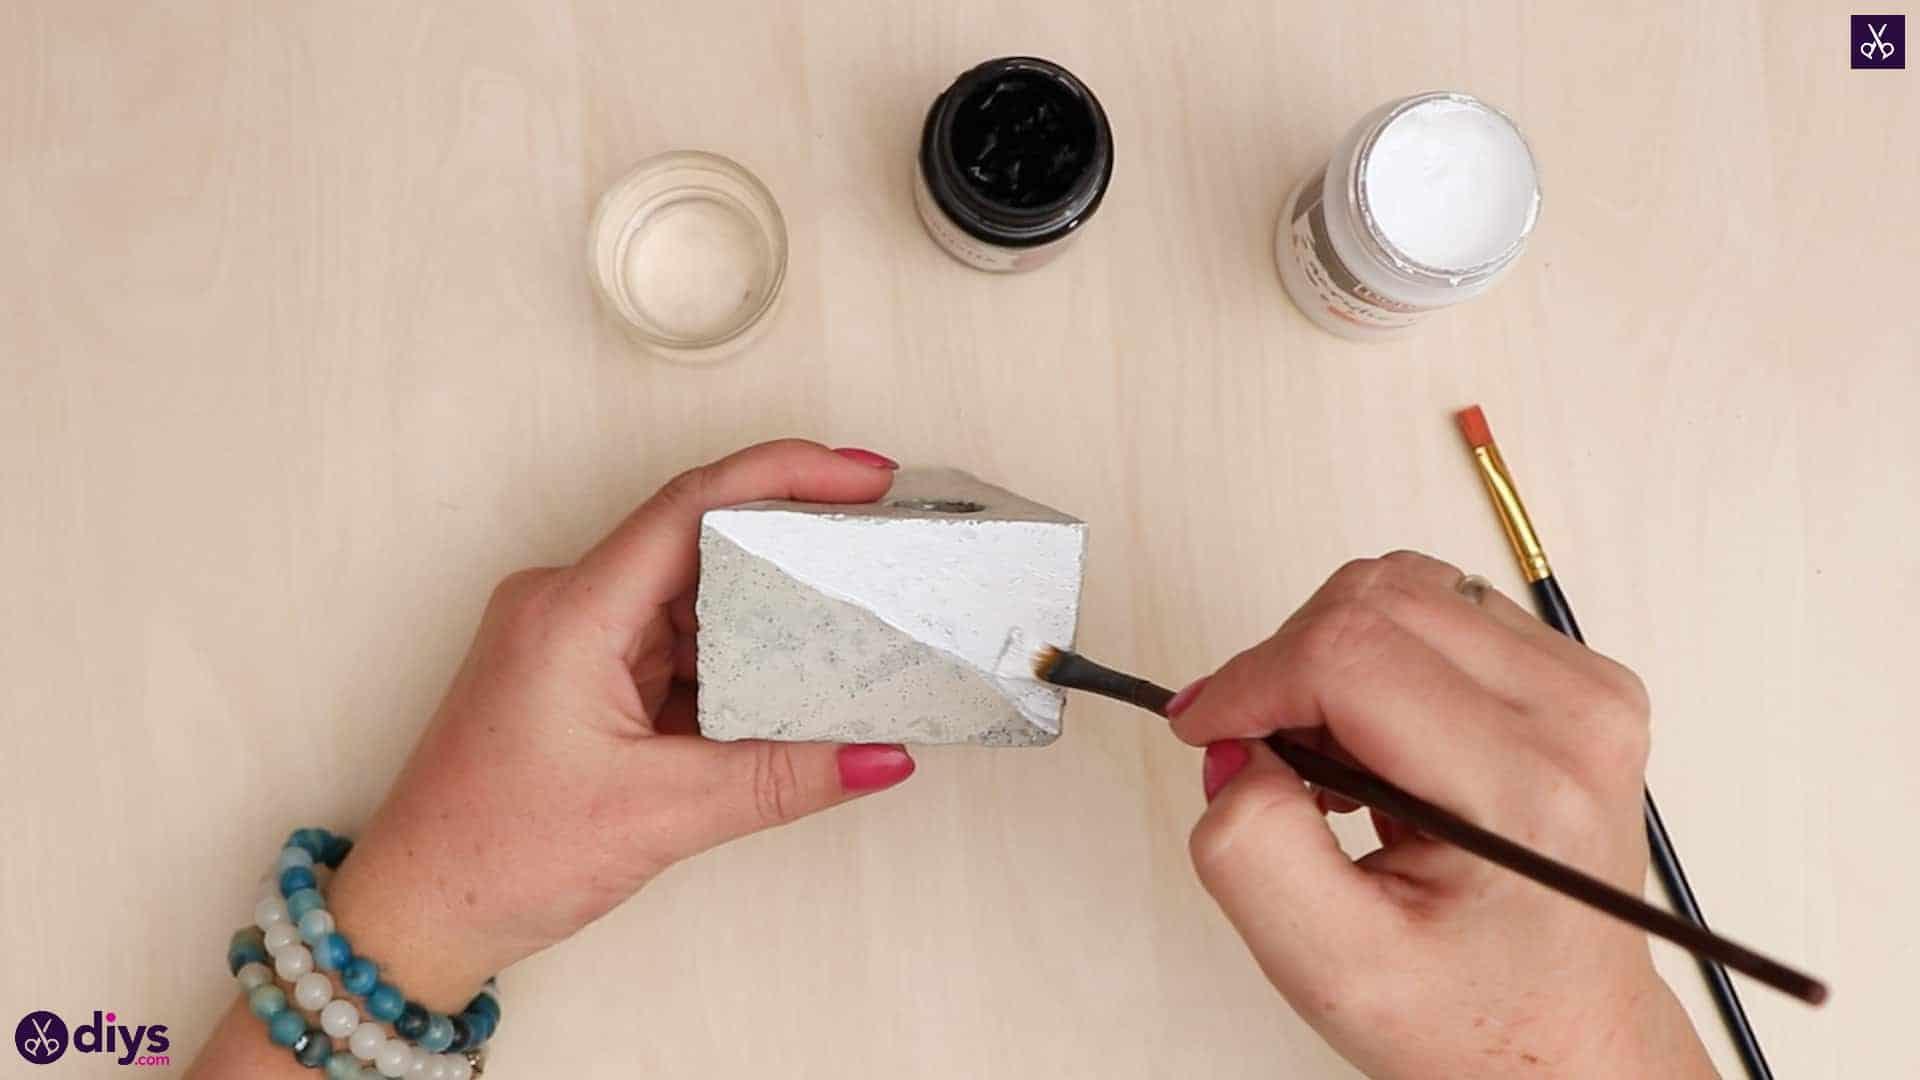 Diy concrete reed diffuser paint